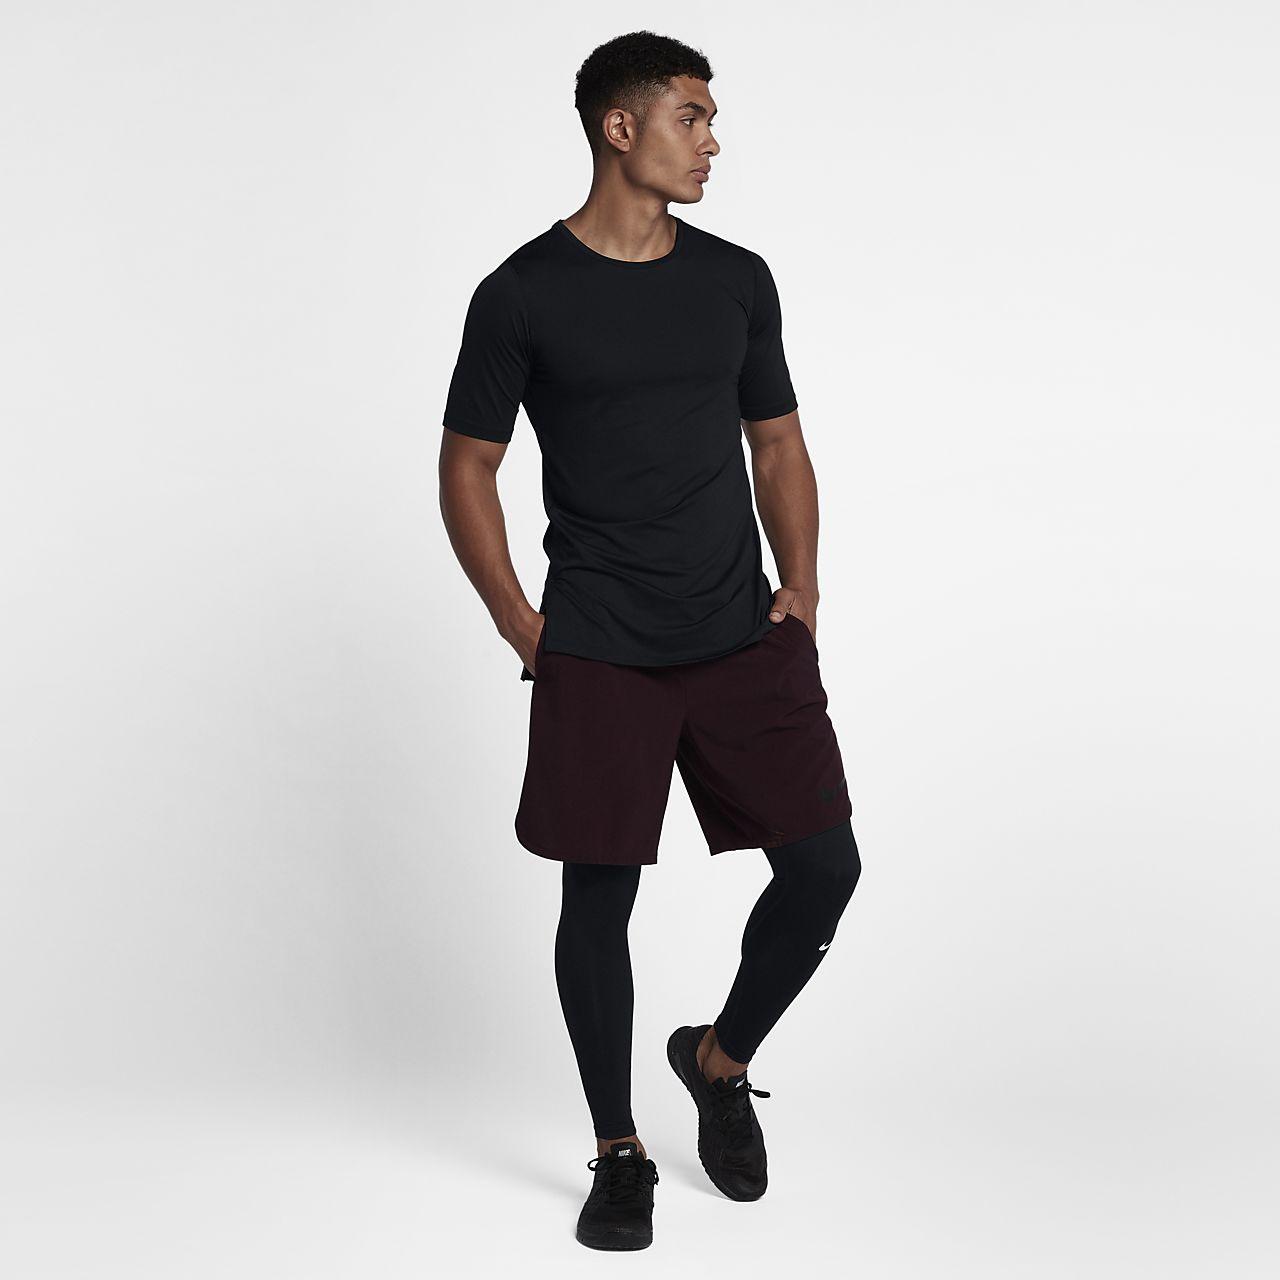 c0275072158 Nike Dri-FIT Men's Utility Short-Sleeve Training Top. Nike.com IE